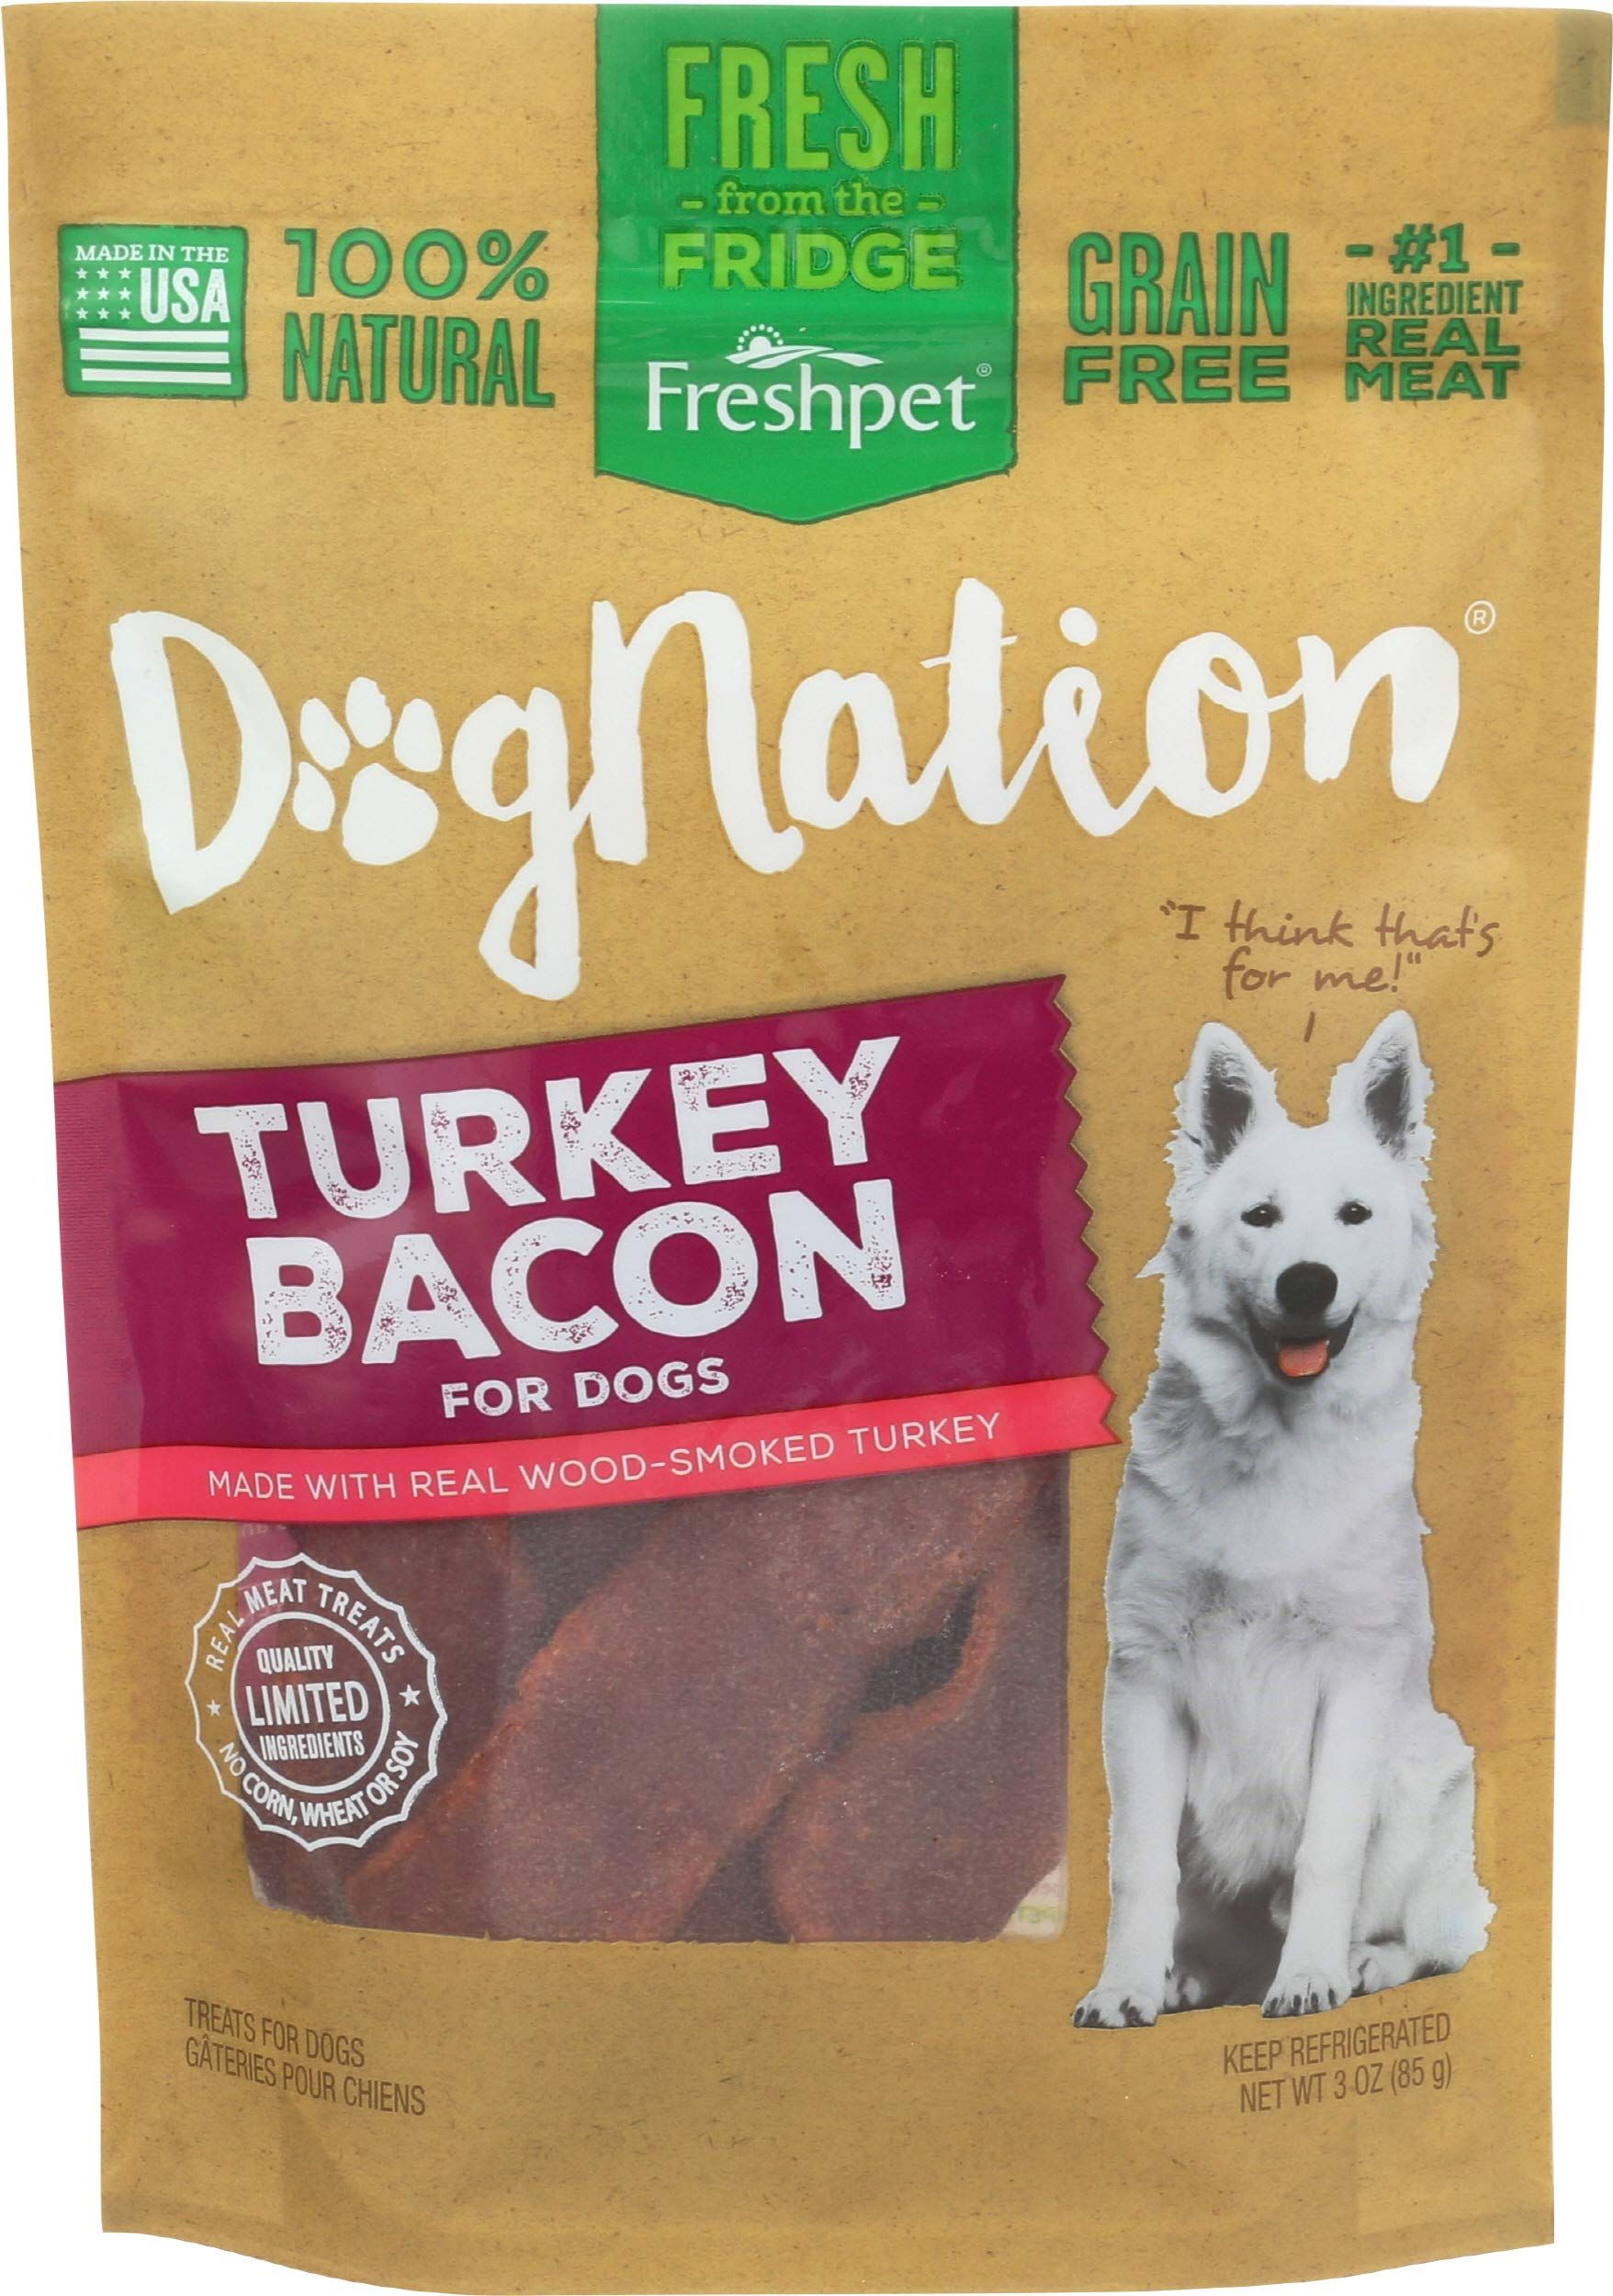 Freshpet Dognation Turkey Bacon pack in